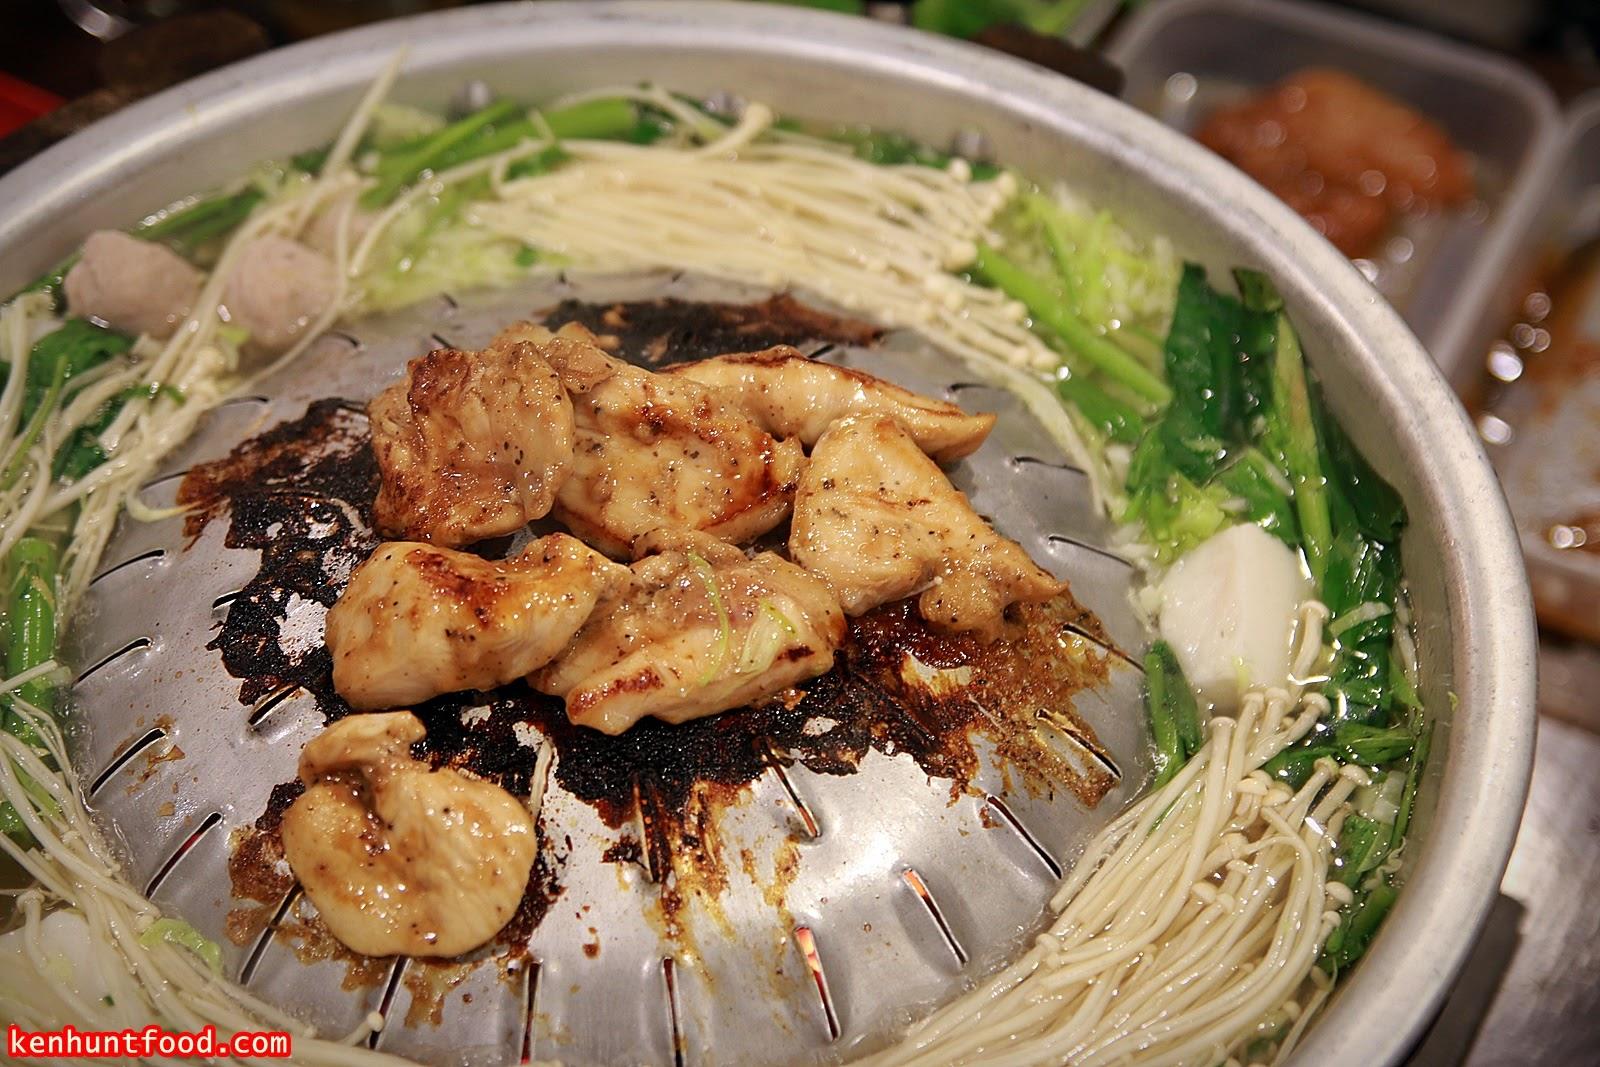 Ken Hunts Food: Bangkok Garden BBQ- Mookata @ Automall, Georgetown ...